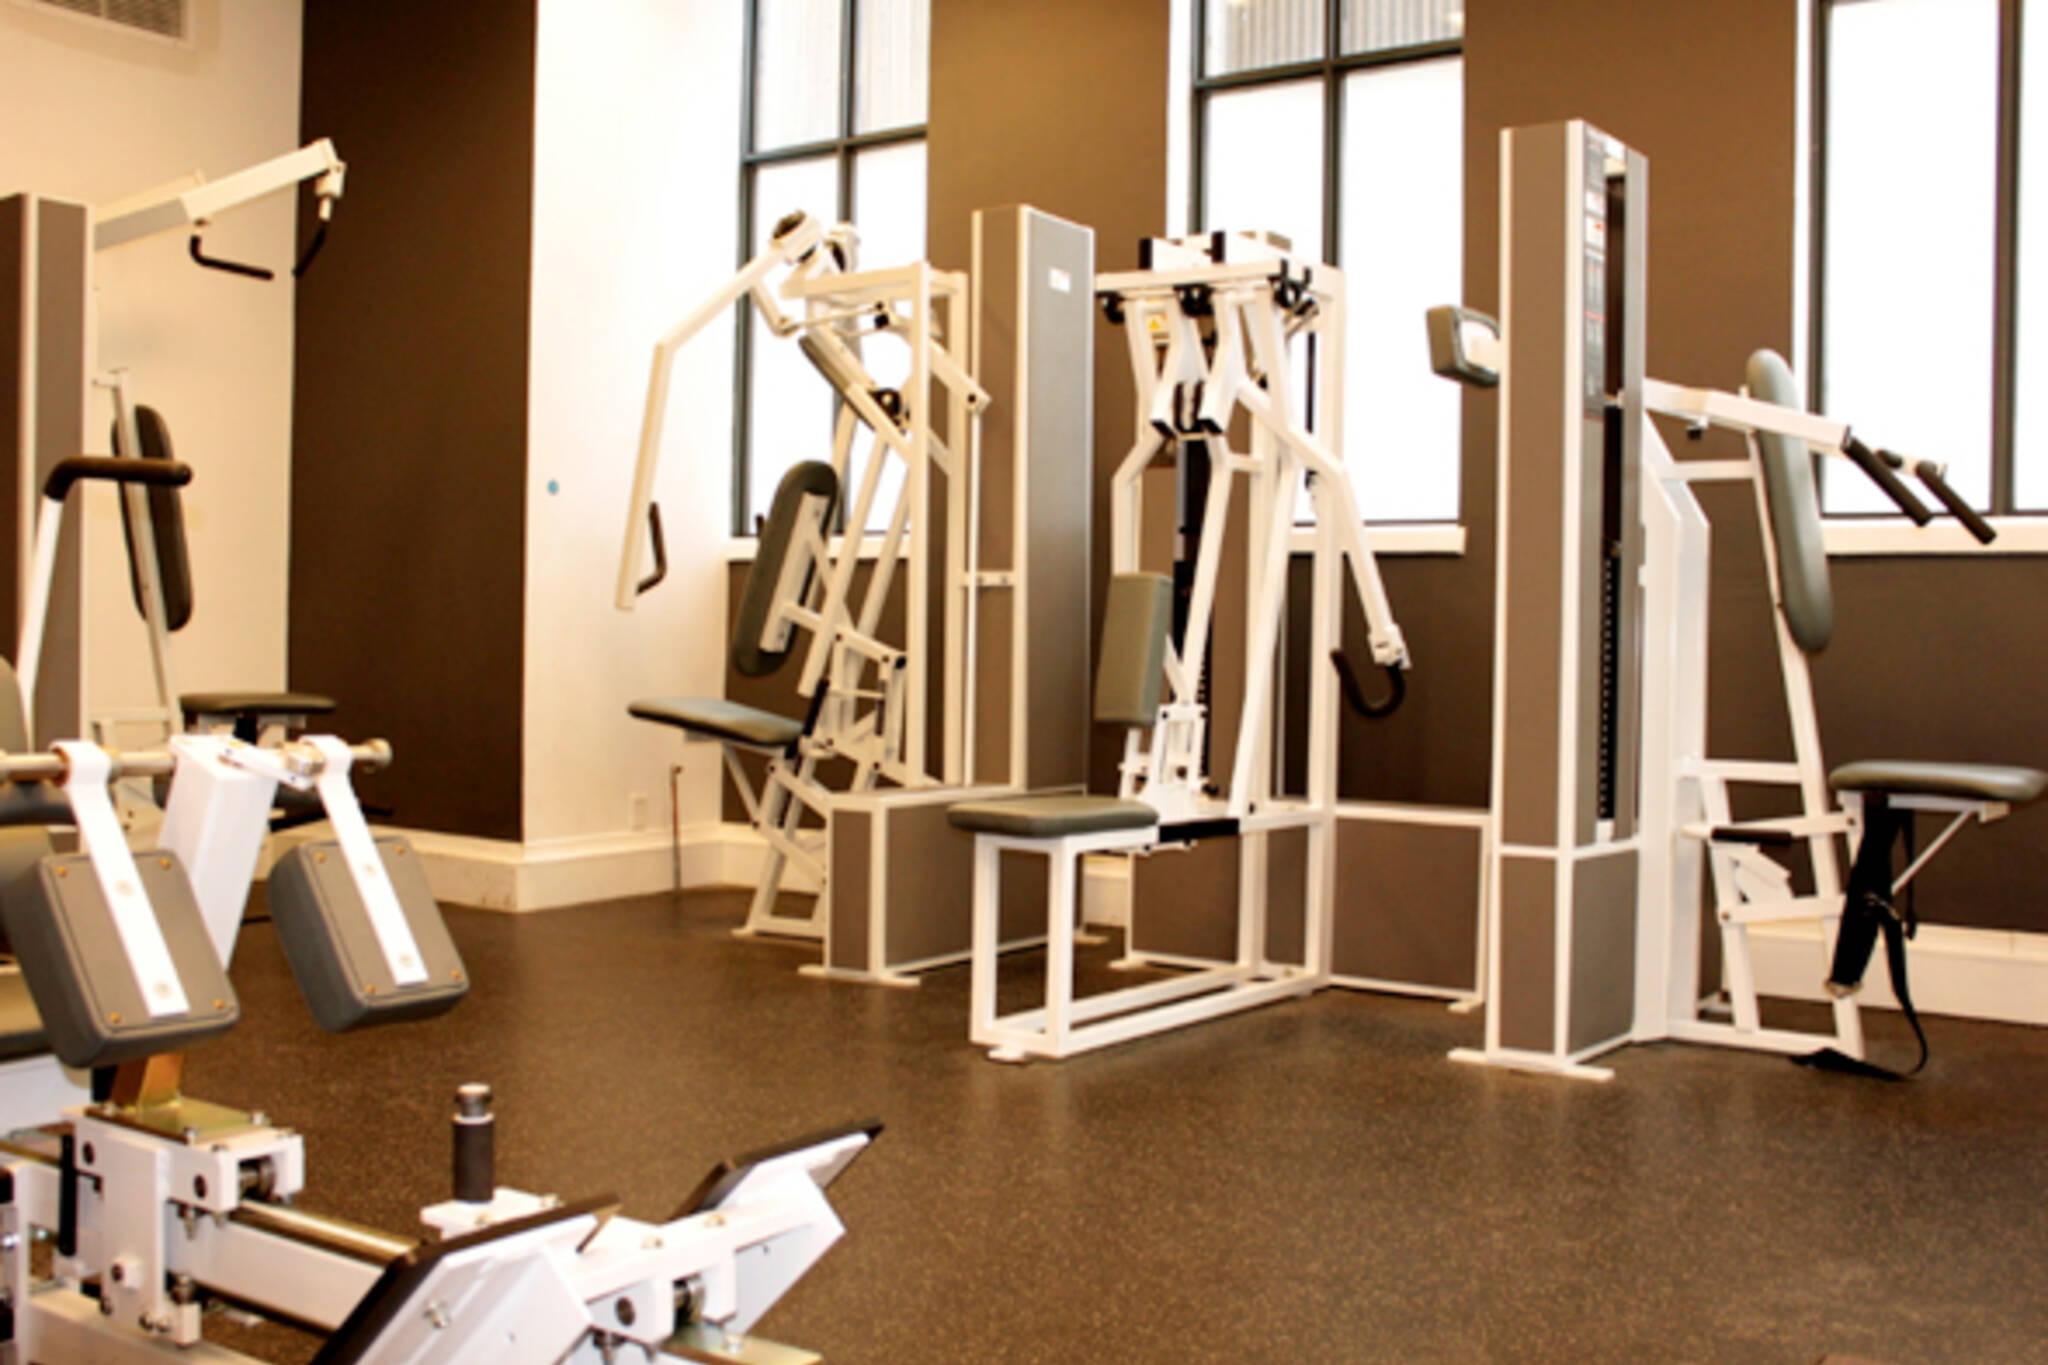 MedX Precision Fitness